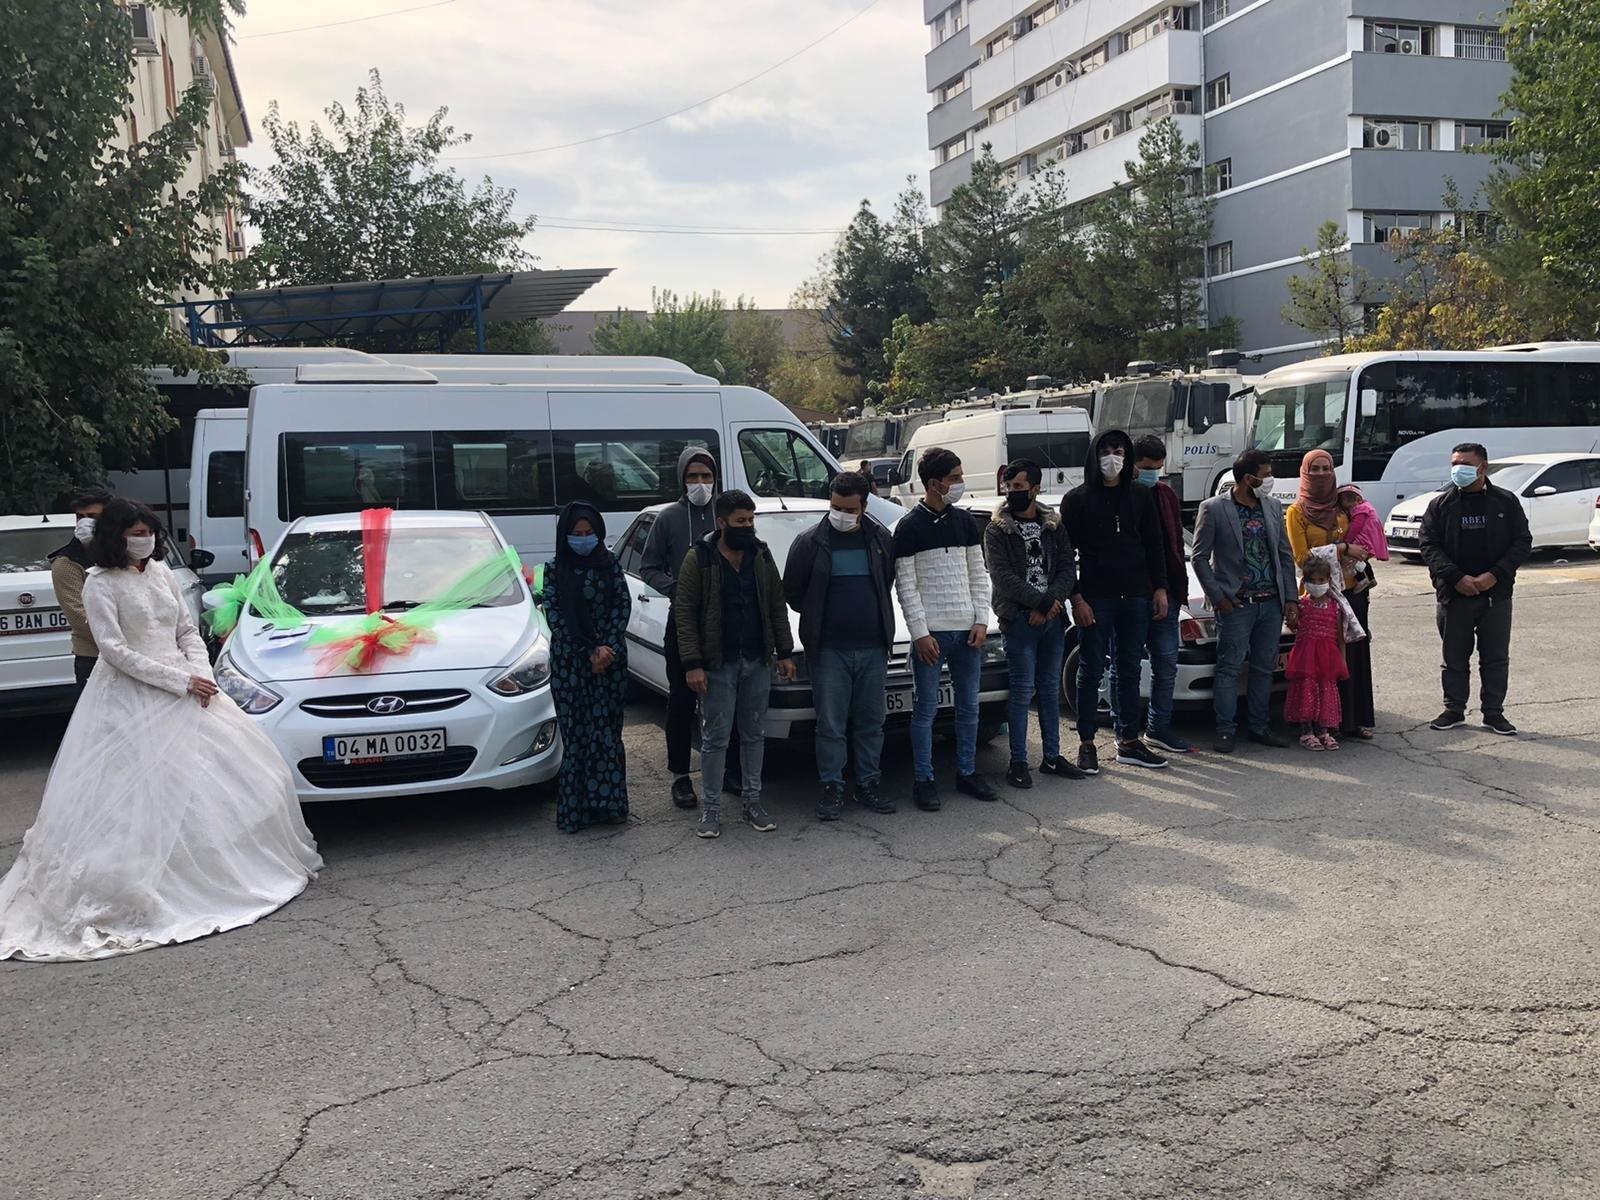 16 illegal migrants caught in fake wedding convoy in Turkey